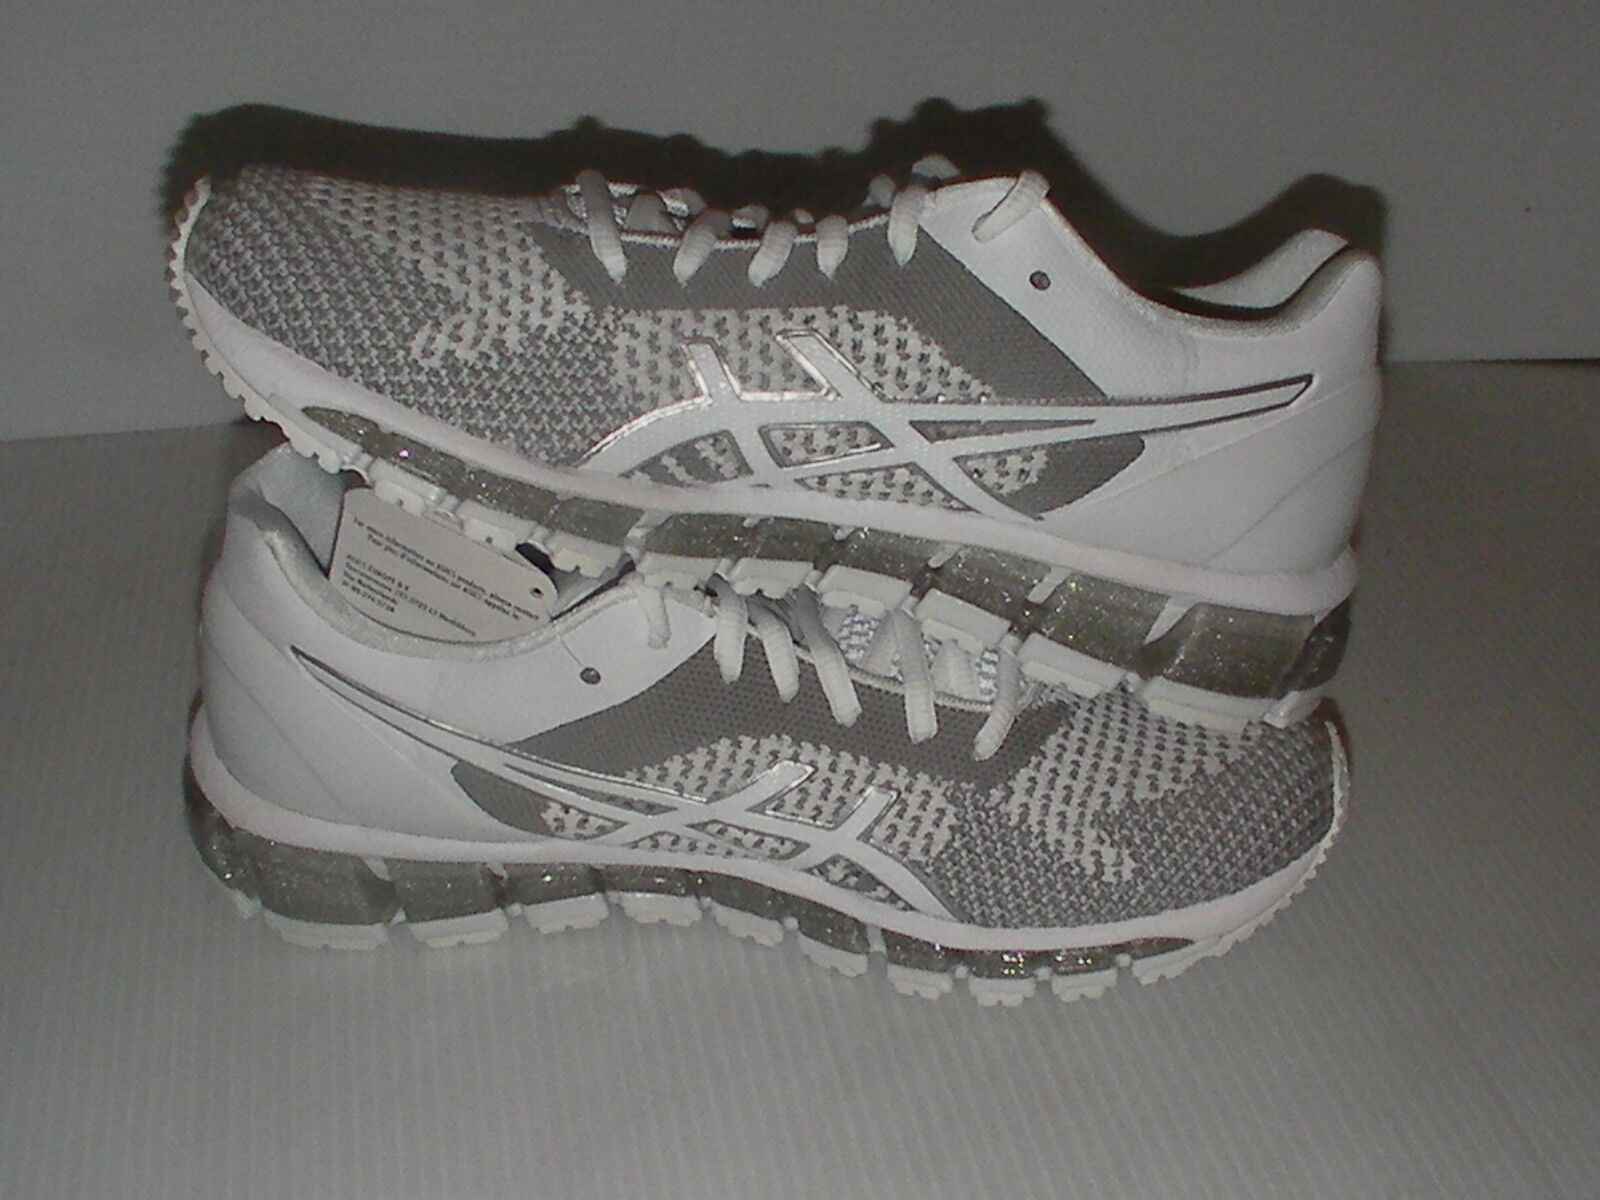 Asics women's women's women's running shoes gel quantum 360 knit white snow silver size 10 us 00bd6b